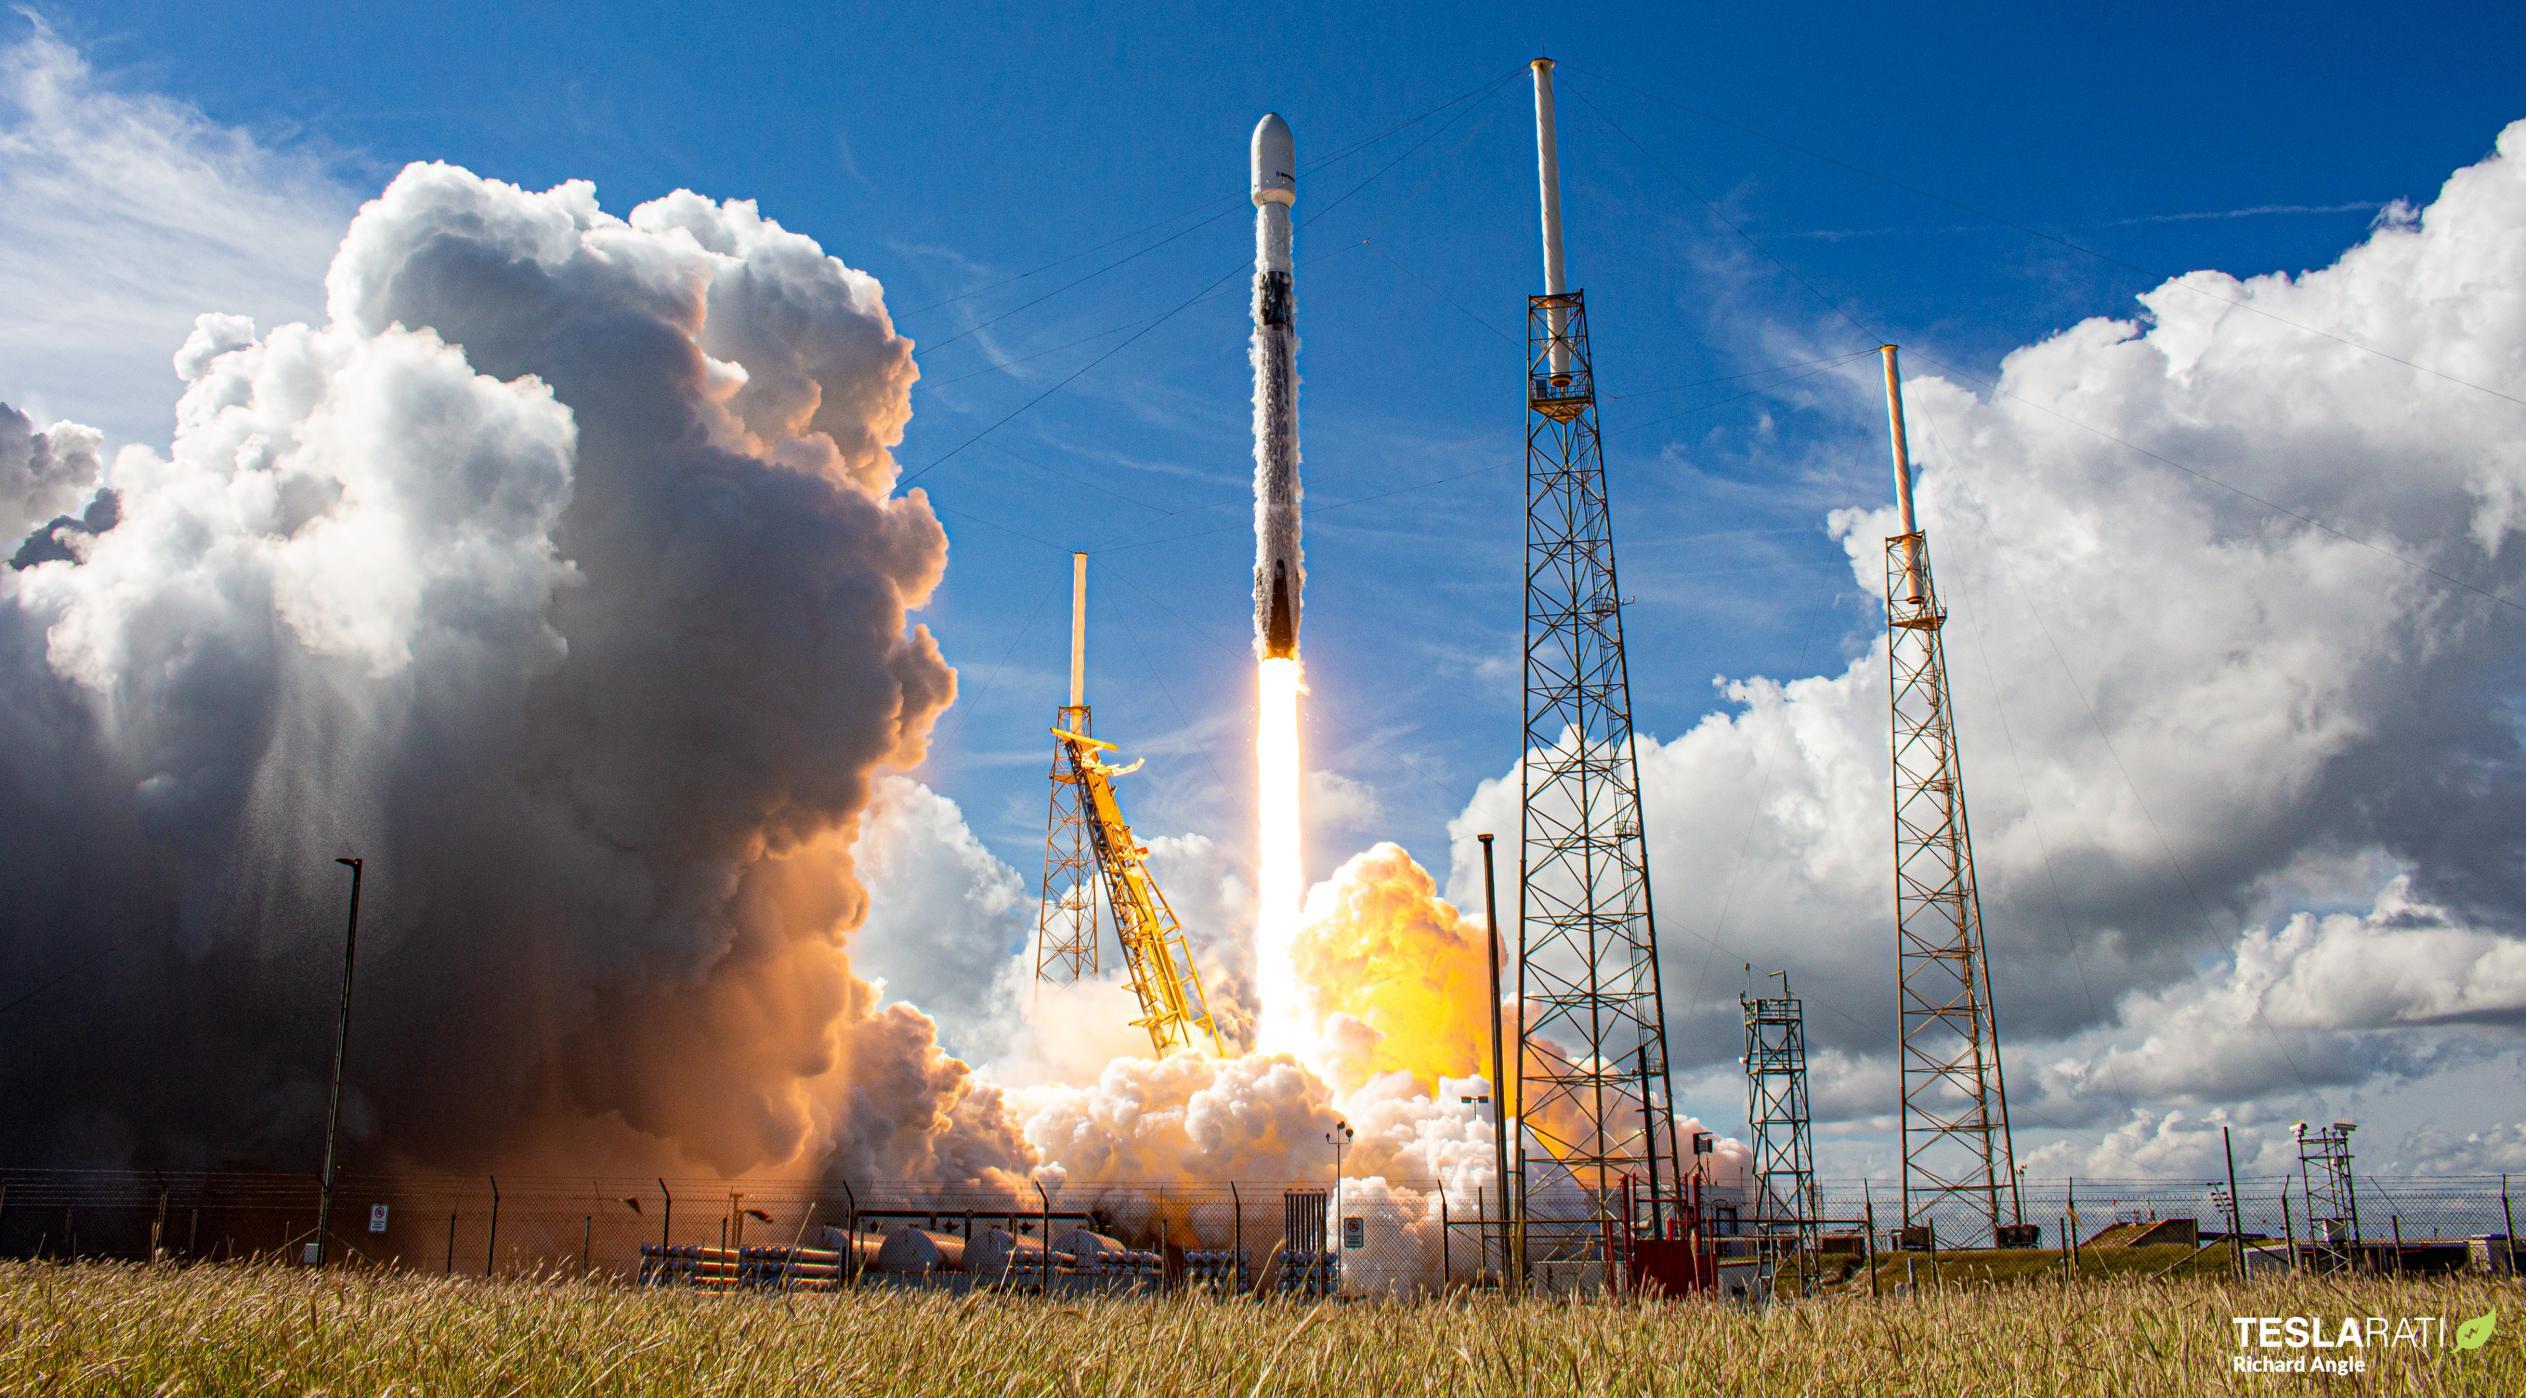 SXM-7 Falcon 9 B1051 LC-40 121320 (Richard Angle) launch 6 crop 1 (c)